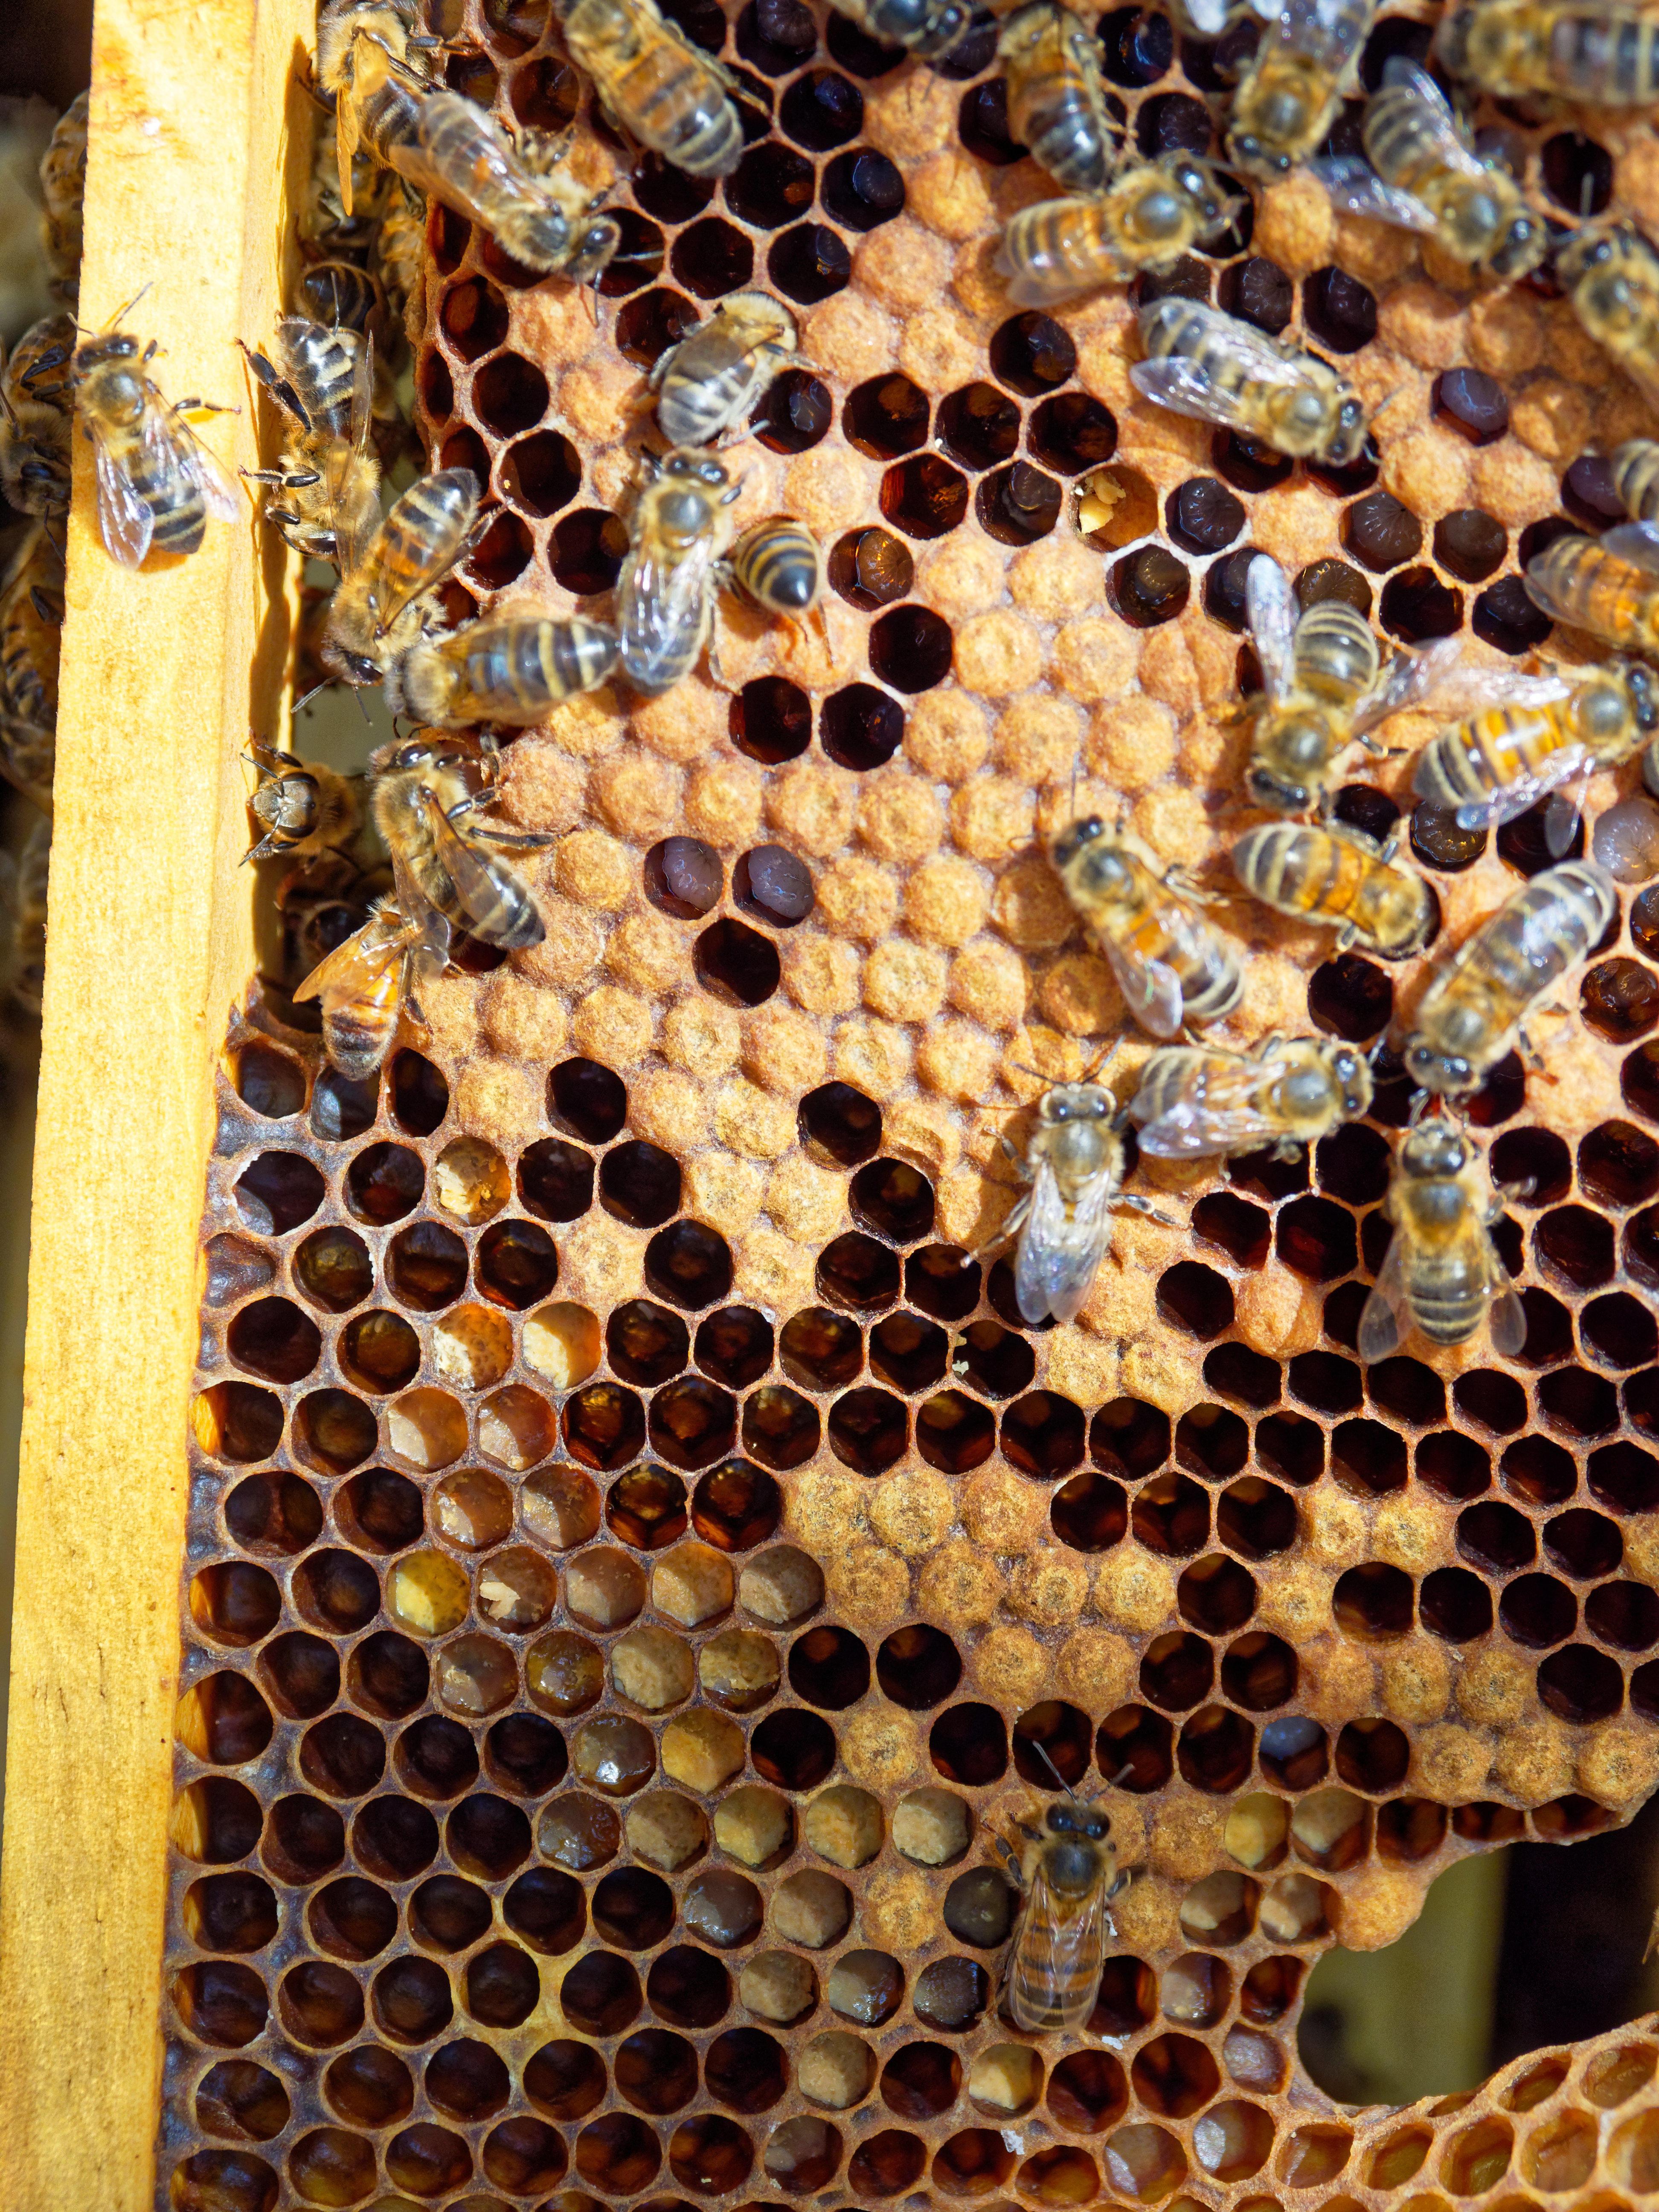 Inspecting-beehives-71.jpeg